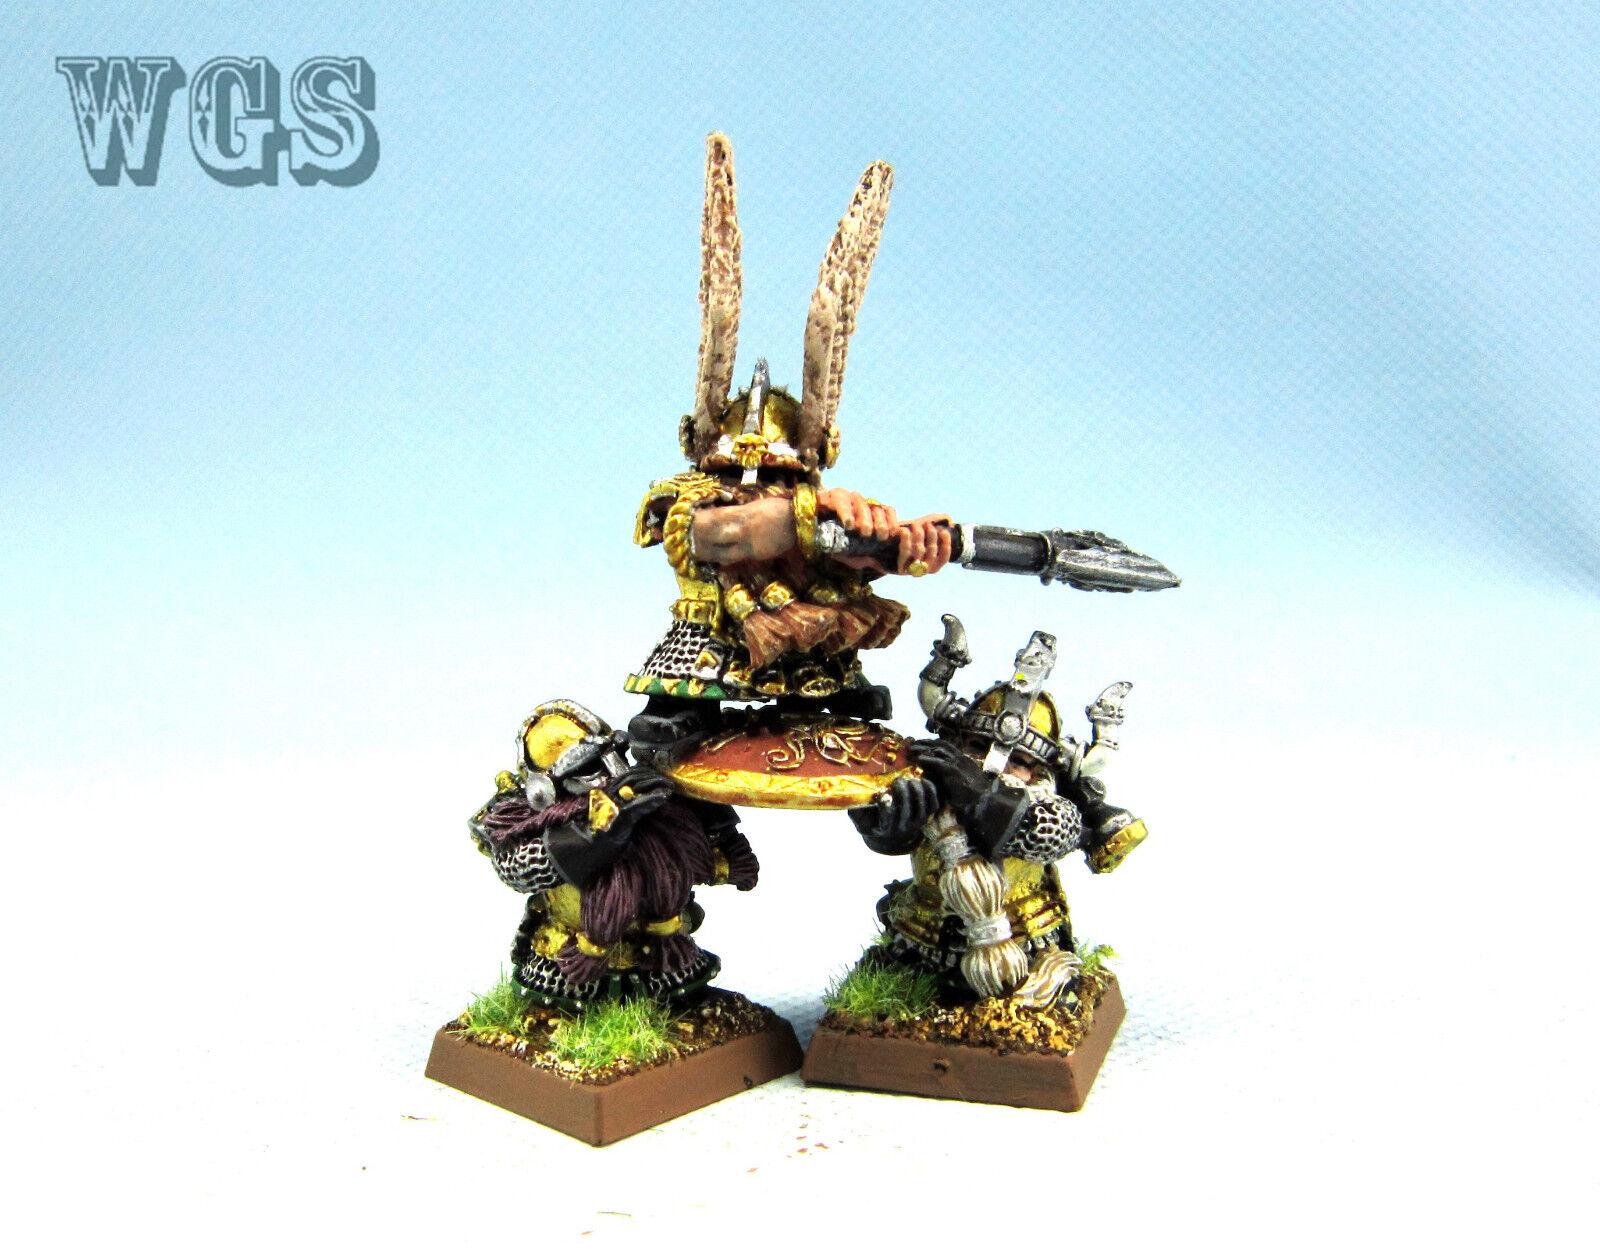 25mm Warhammer Fantasy WGS painted Dwarf King Alrik & Shieldbearers DW053